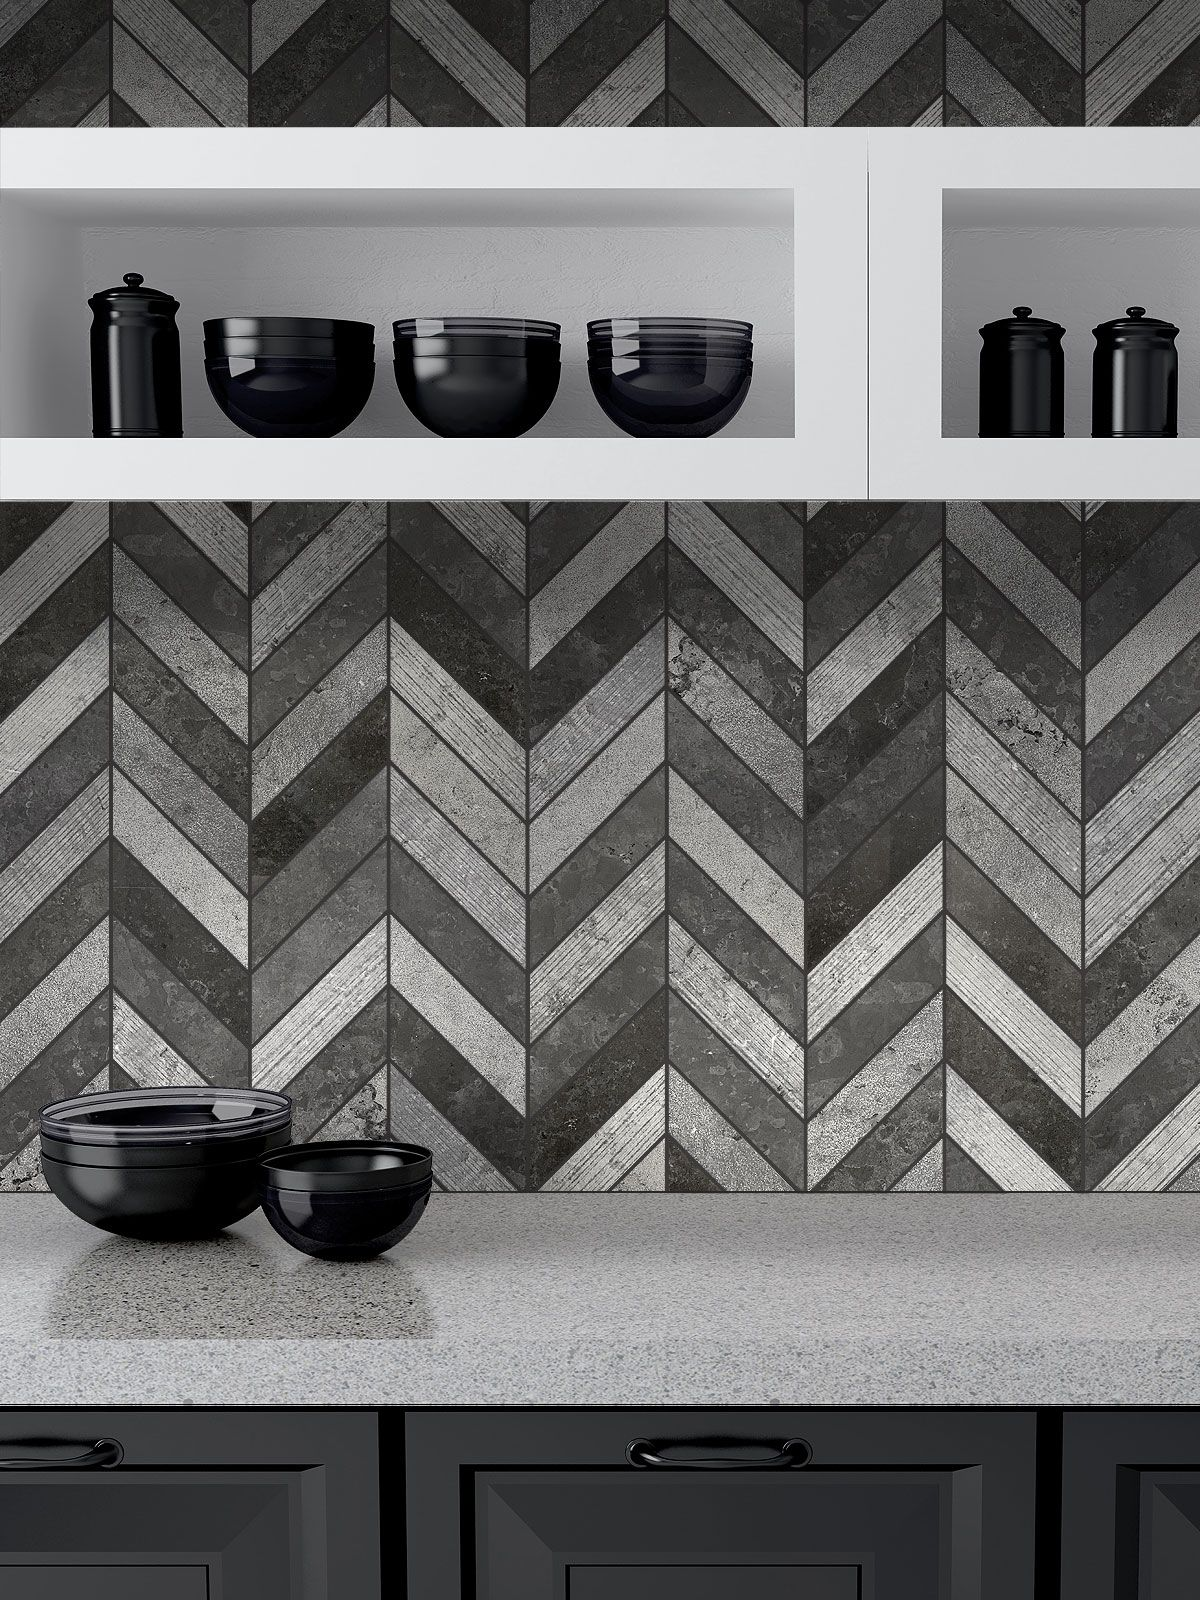 Backsplash Com Kitchen Backsplash Tiles Ideas Tile Backsplash Black Backsplash Backsplash